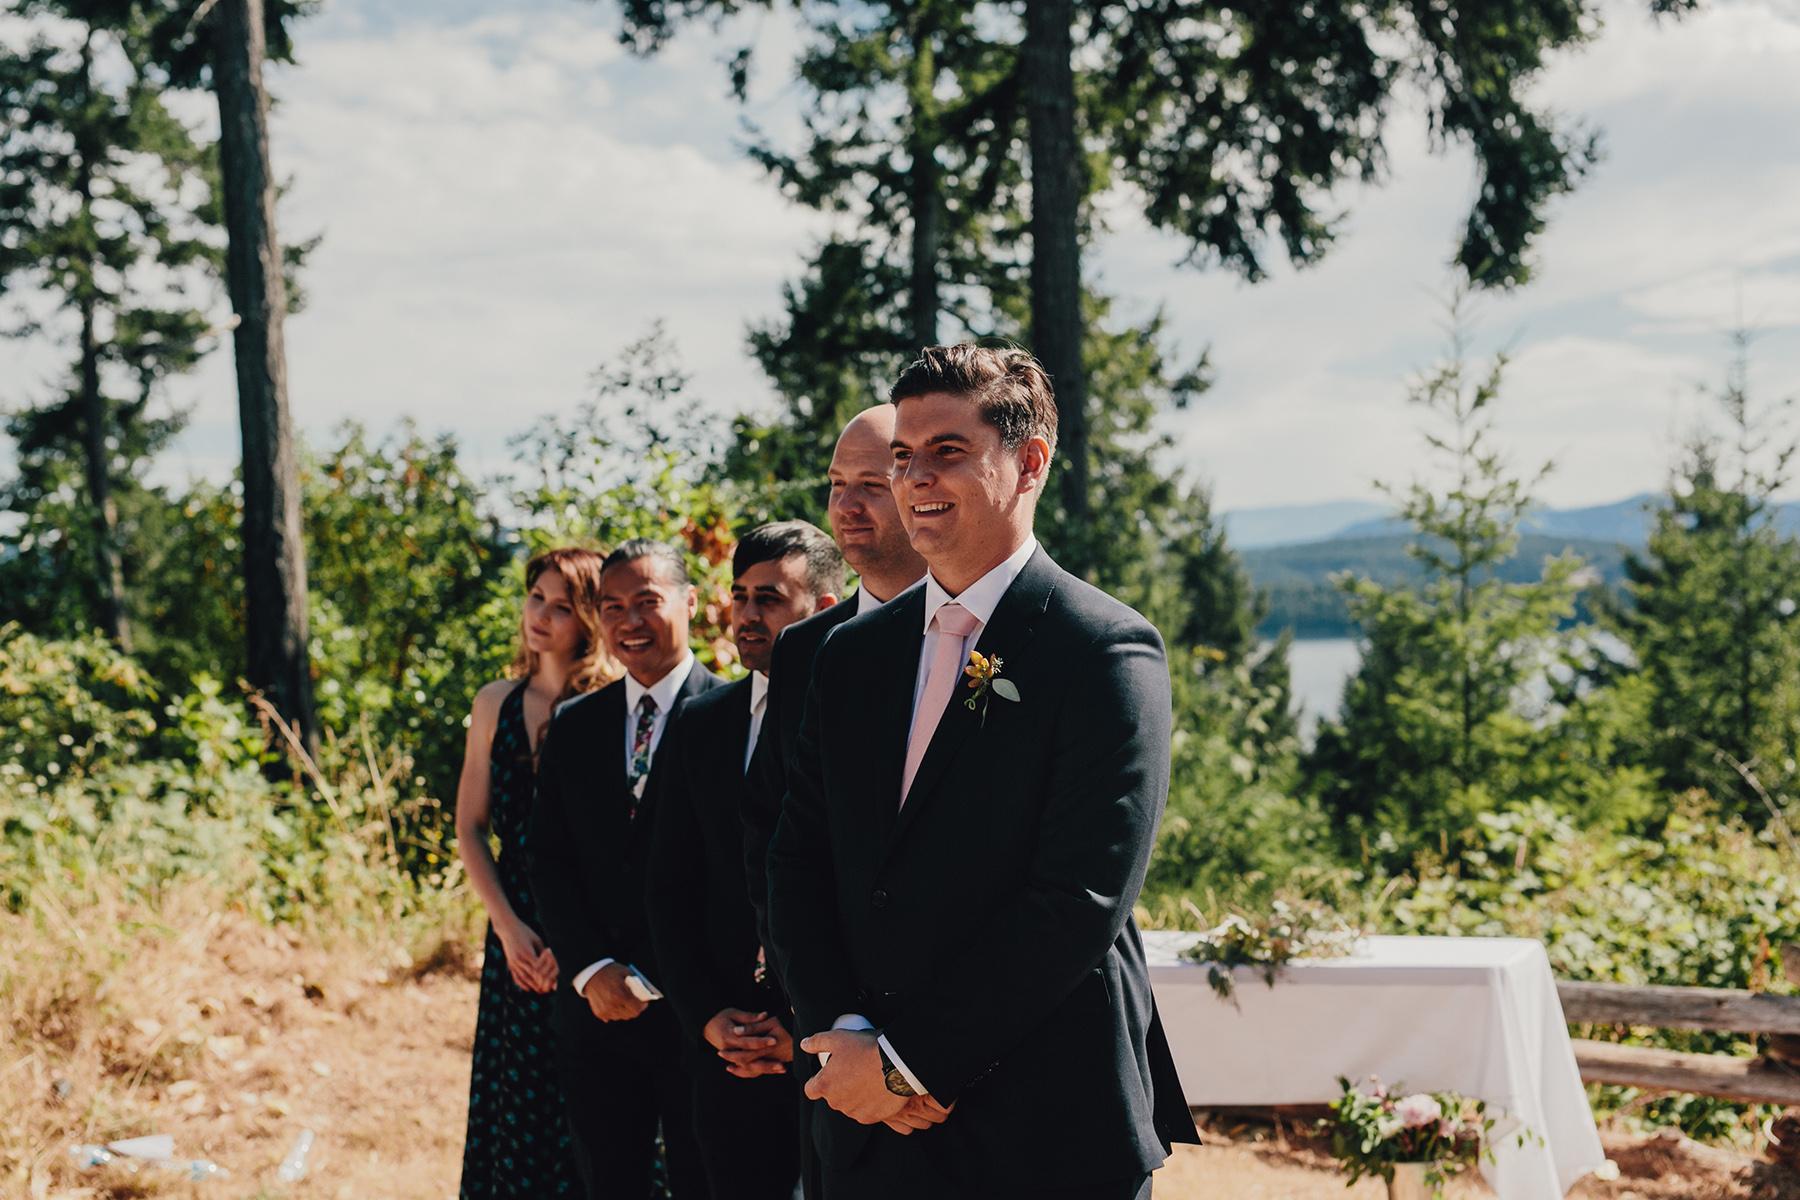 galiano-island-bodega-destination-wedding-0051.JPG